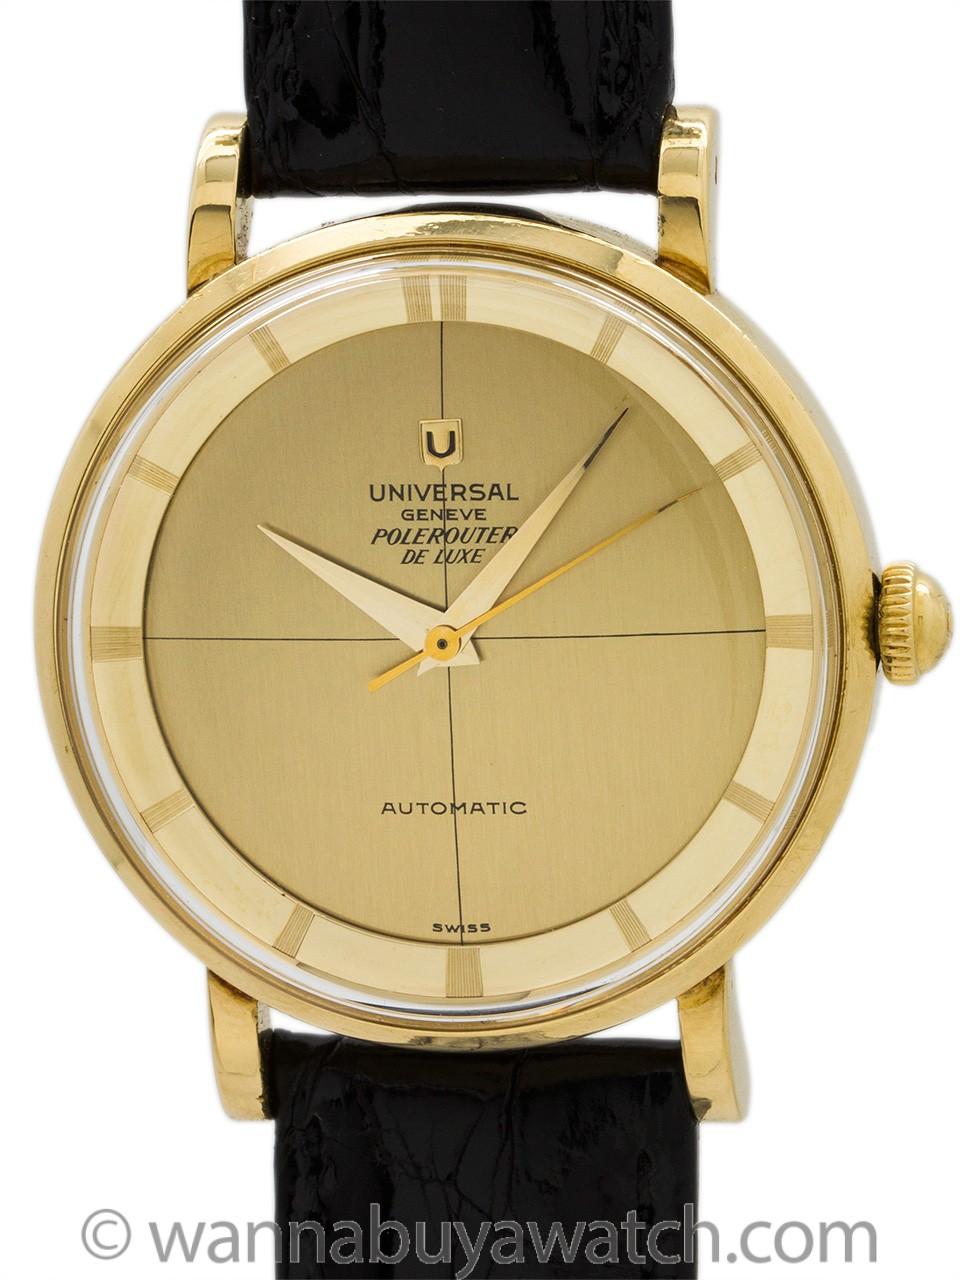 Universal Geneve Pole Router De Luxe Chronometer circa 1960's